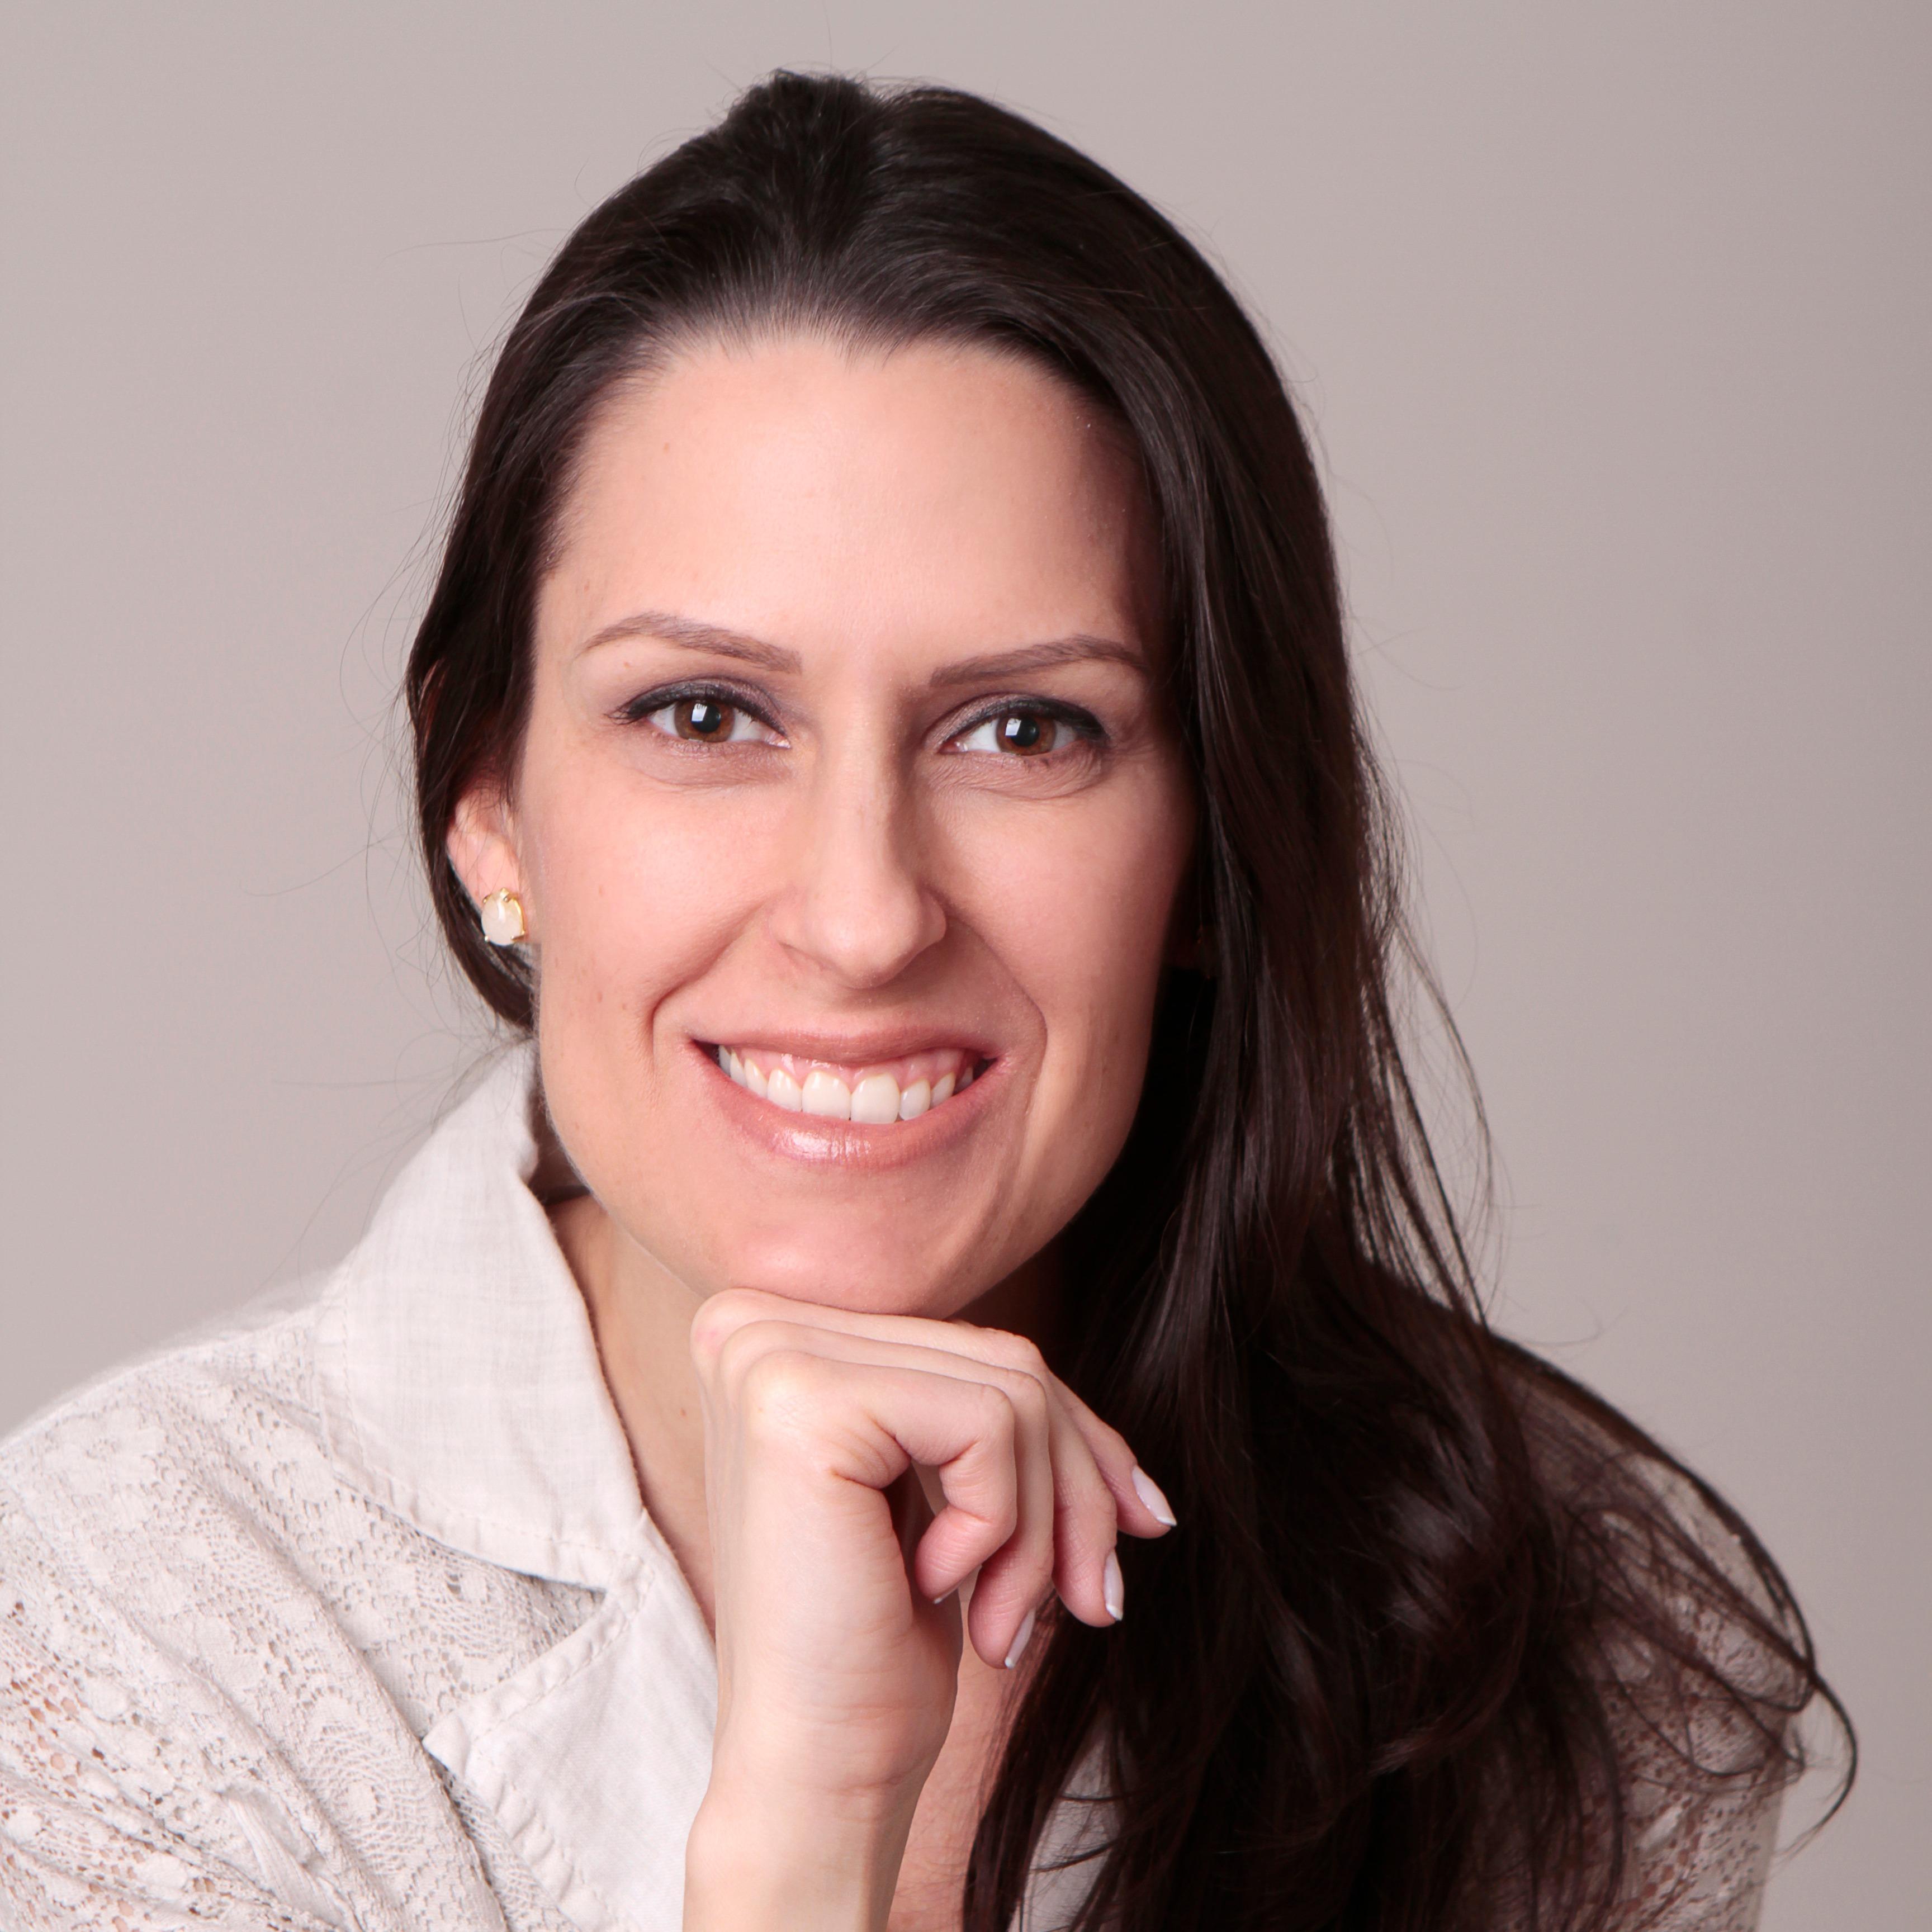 Cintia Raulino